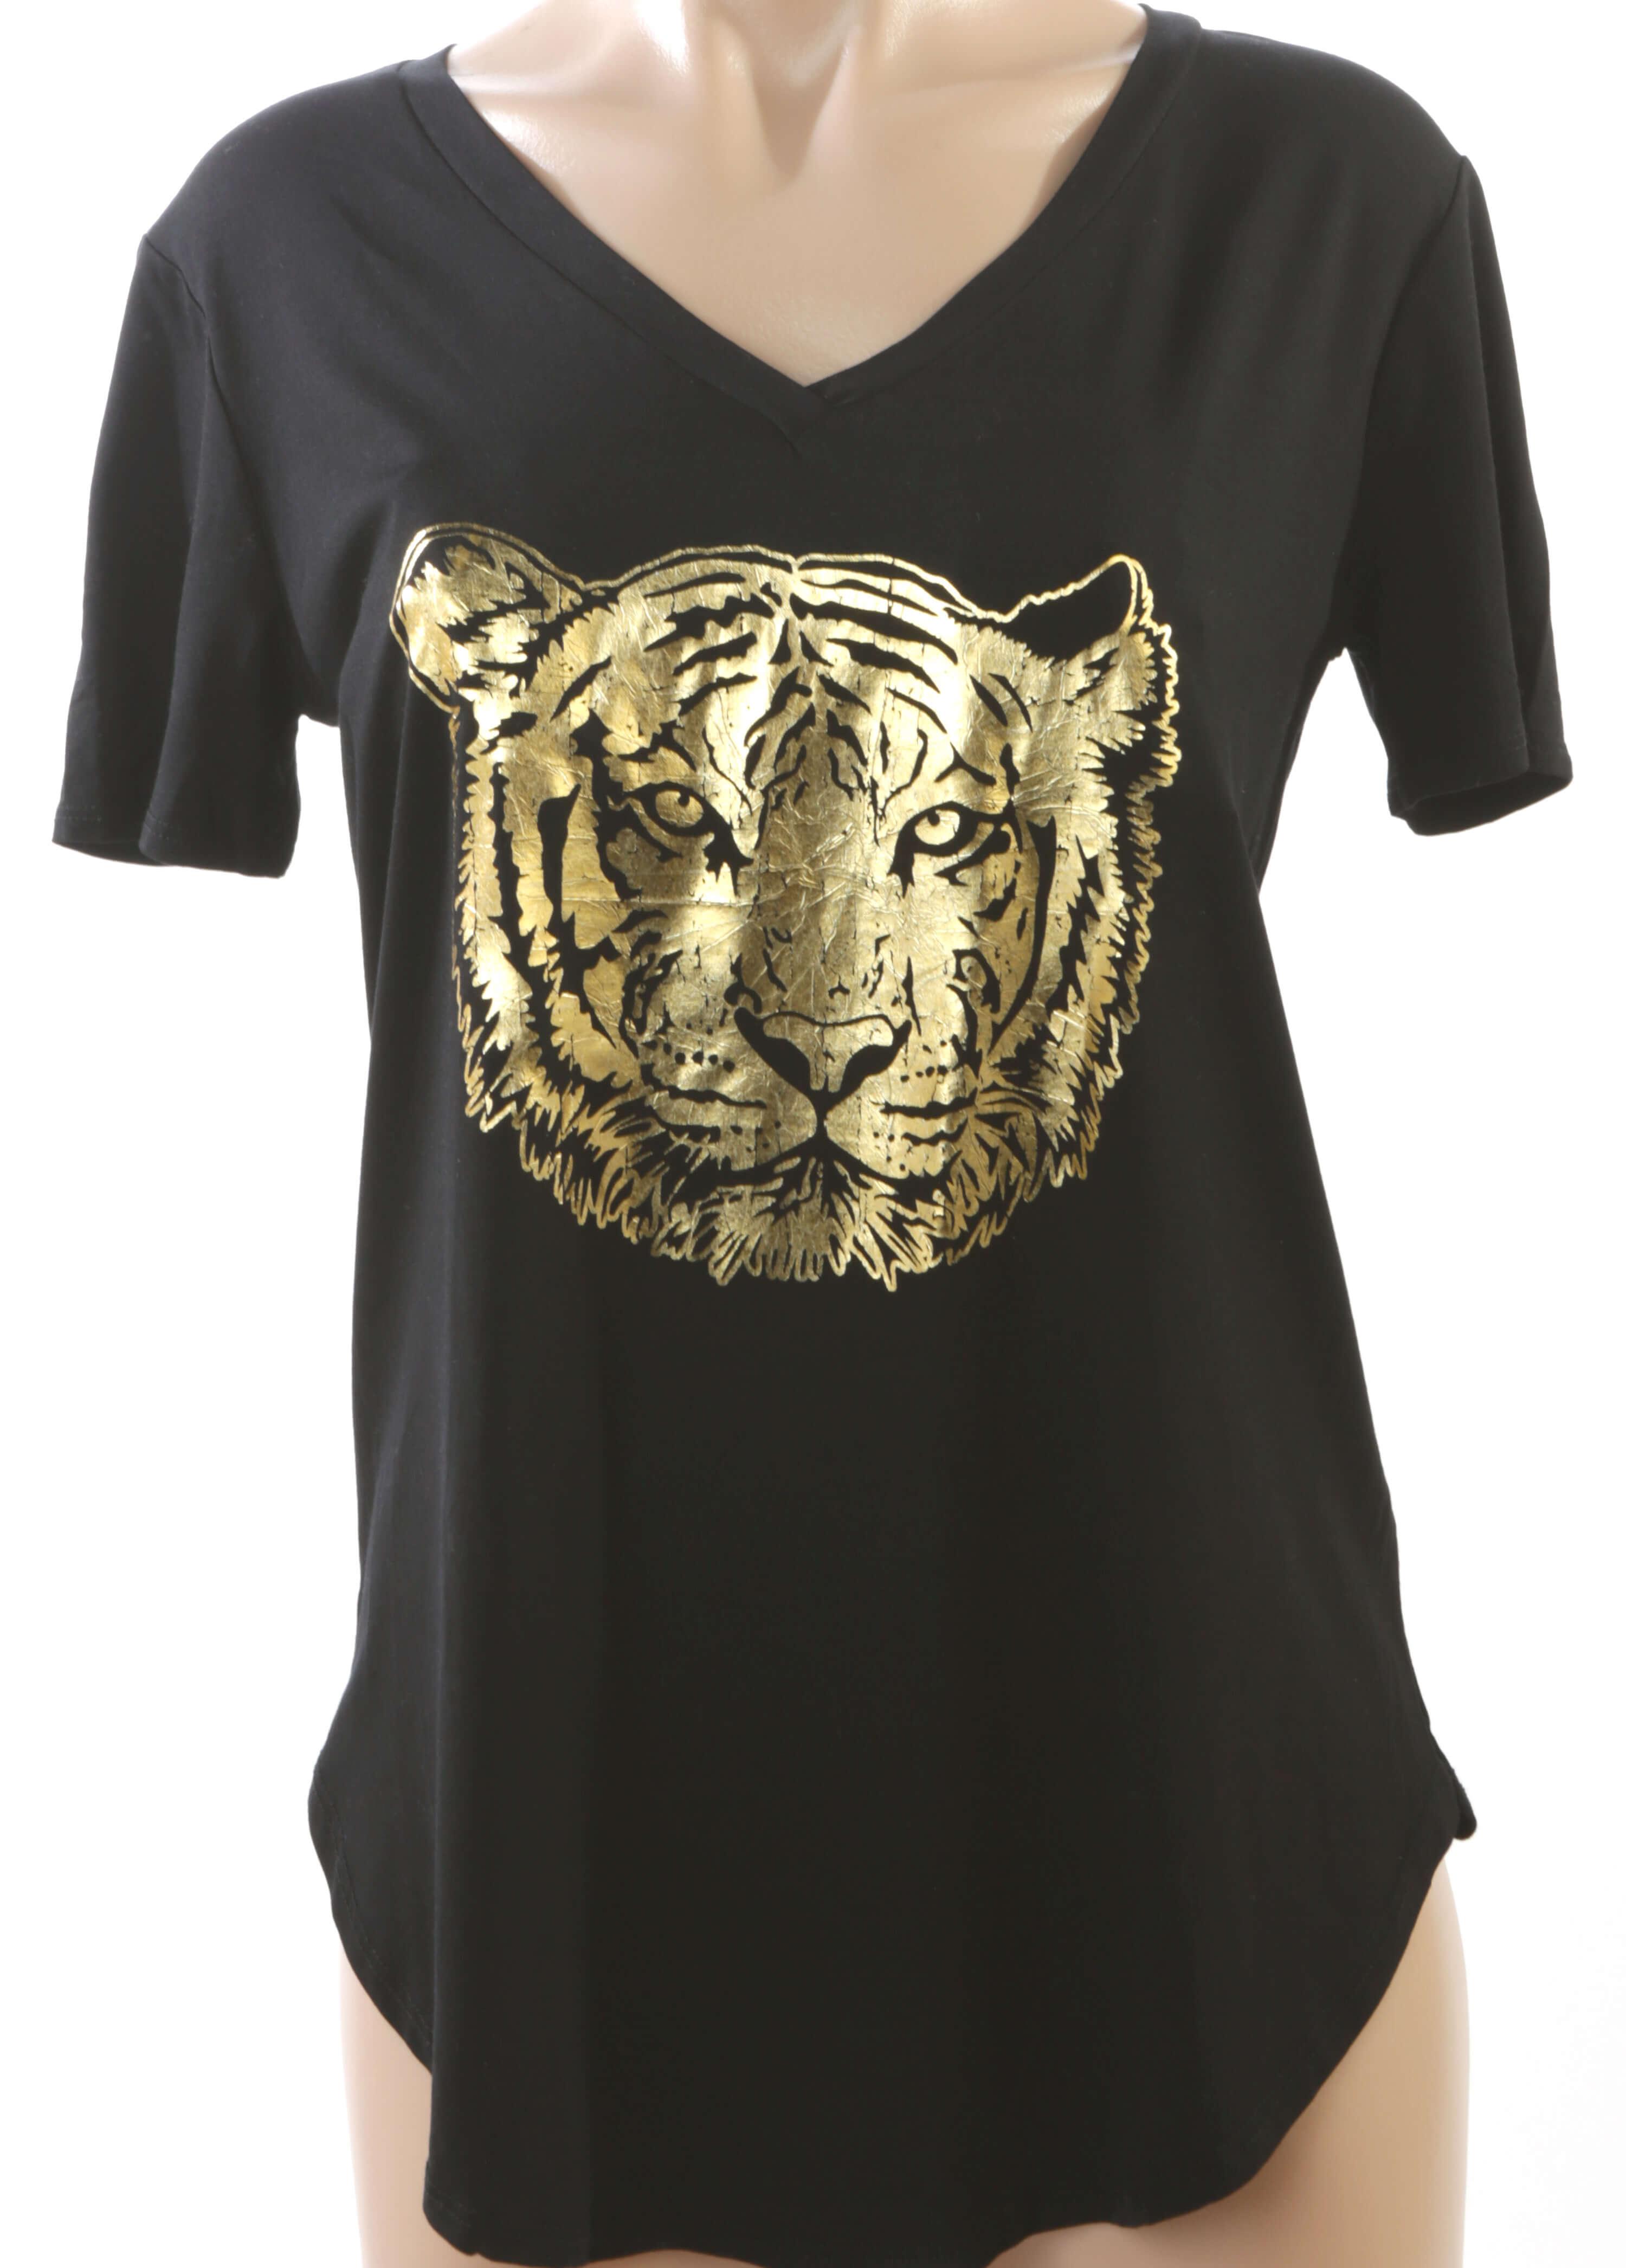 Mizzou women's tiger T-shirt